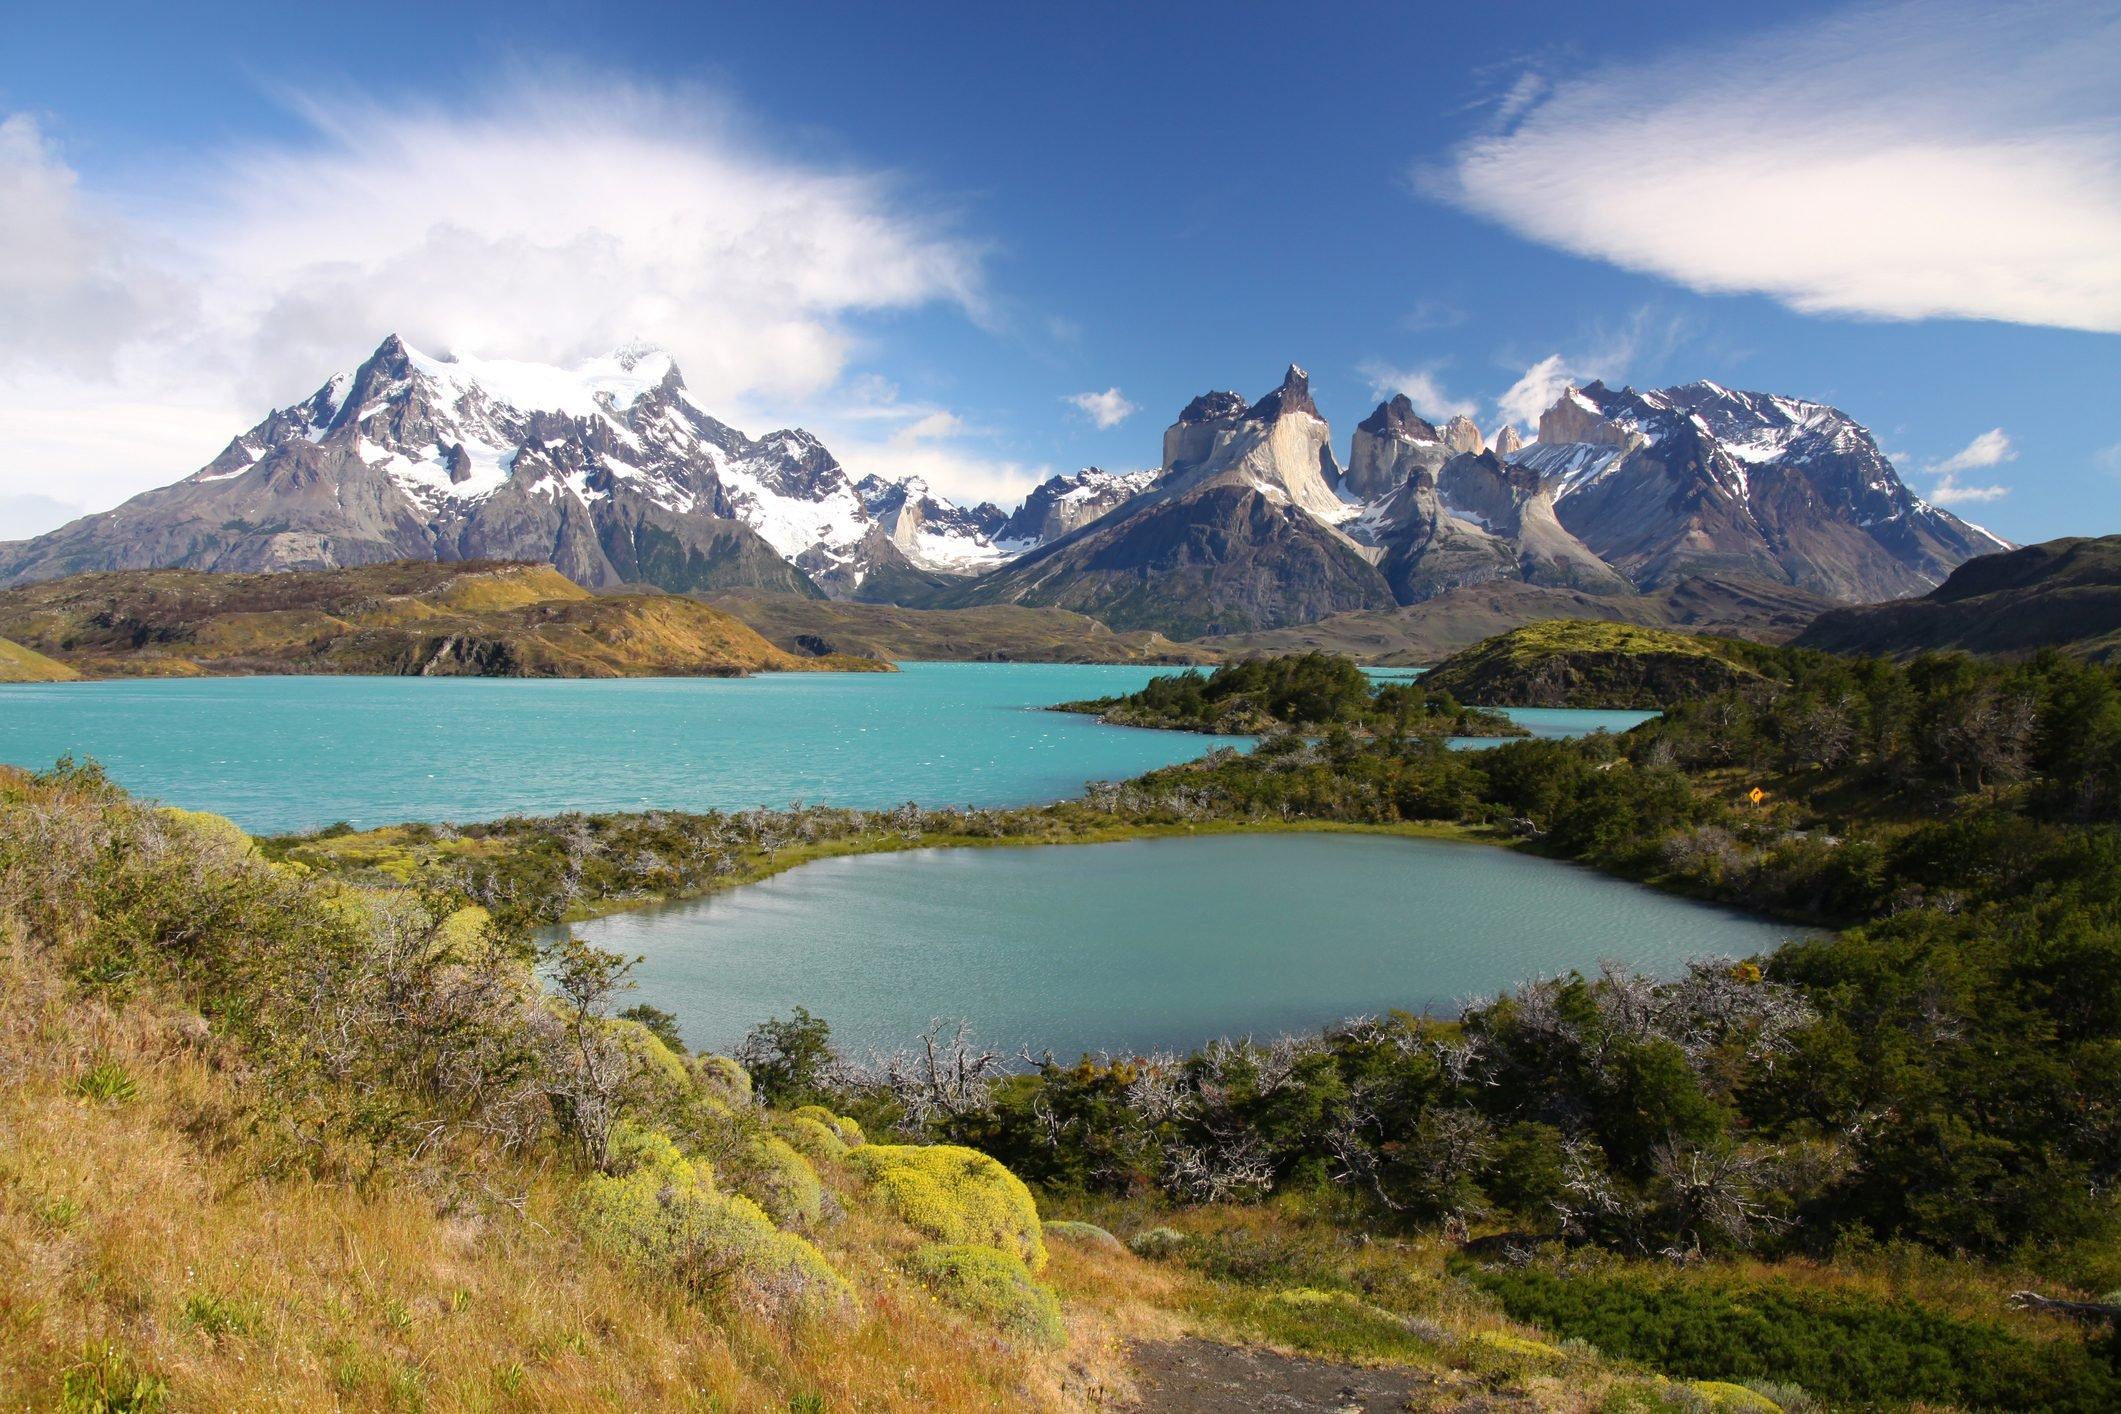 Torres del Paine, Lago Pehoé